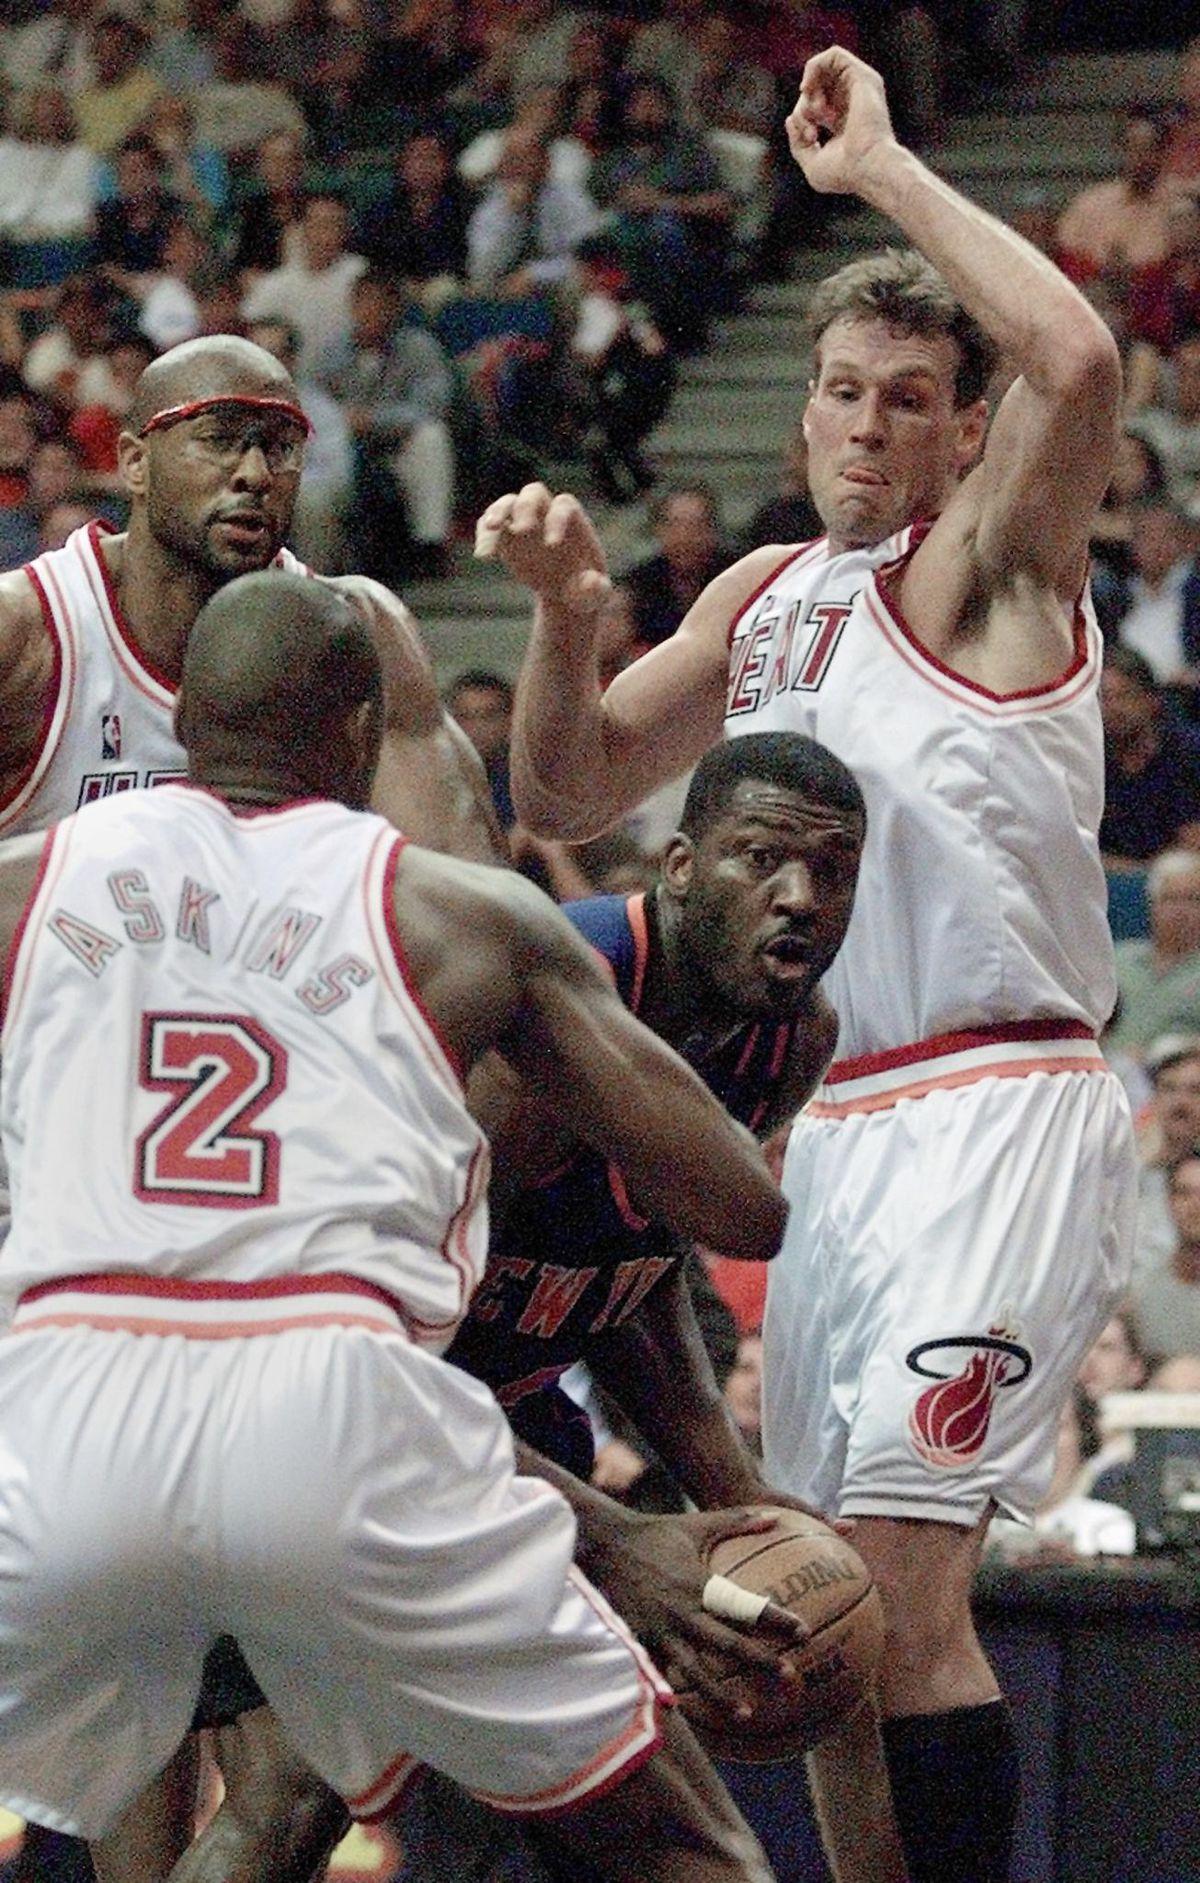 Larry Johnson (C) of the New York Knicks is surrou